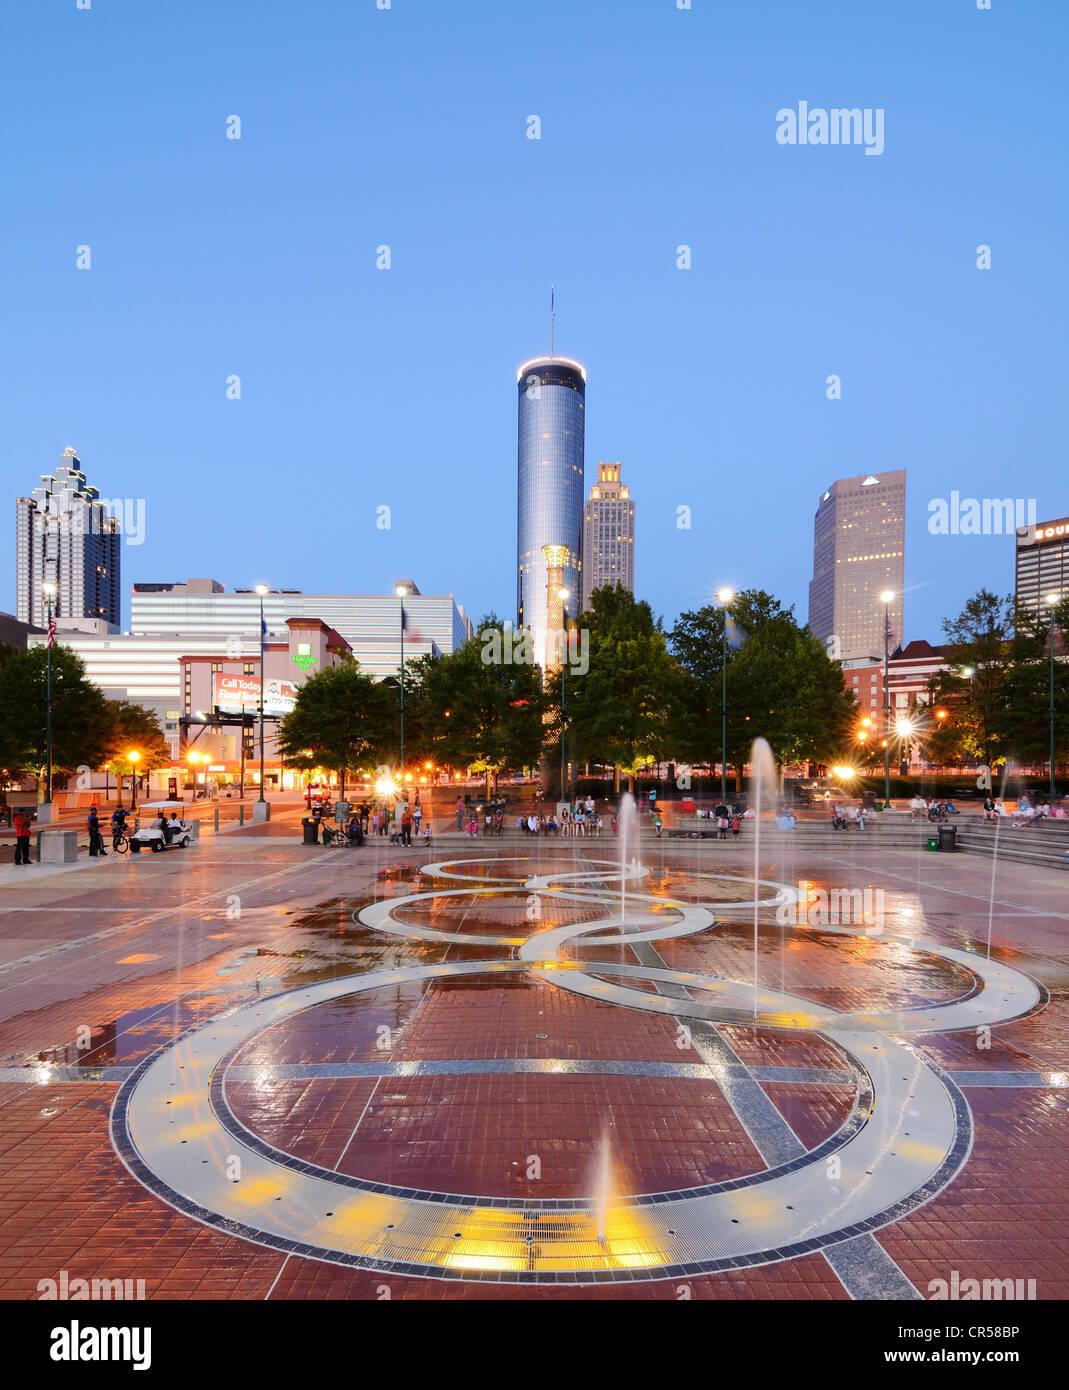 Centennial Olympic Park in Atlanta, Georgia, USA. - Stock Image